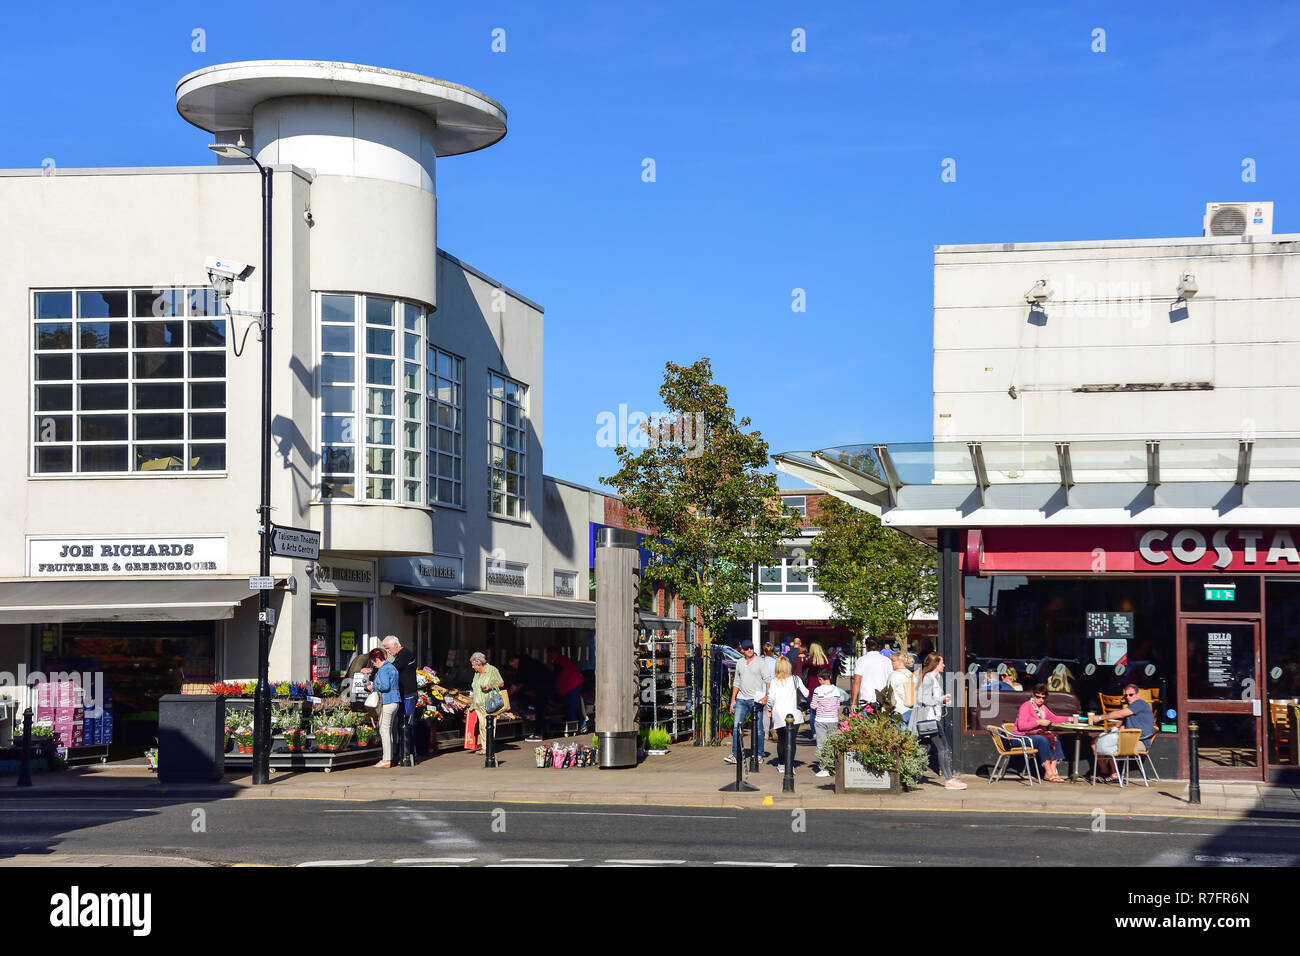 Entrance to Talisman Square, Kenilworth, Warwickshire, England, United Kingdom - Stock Image